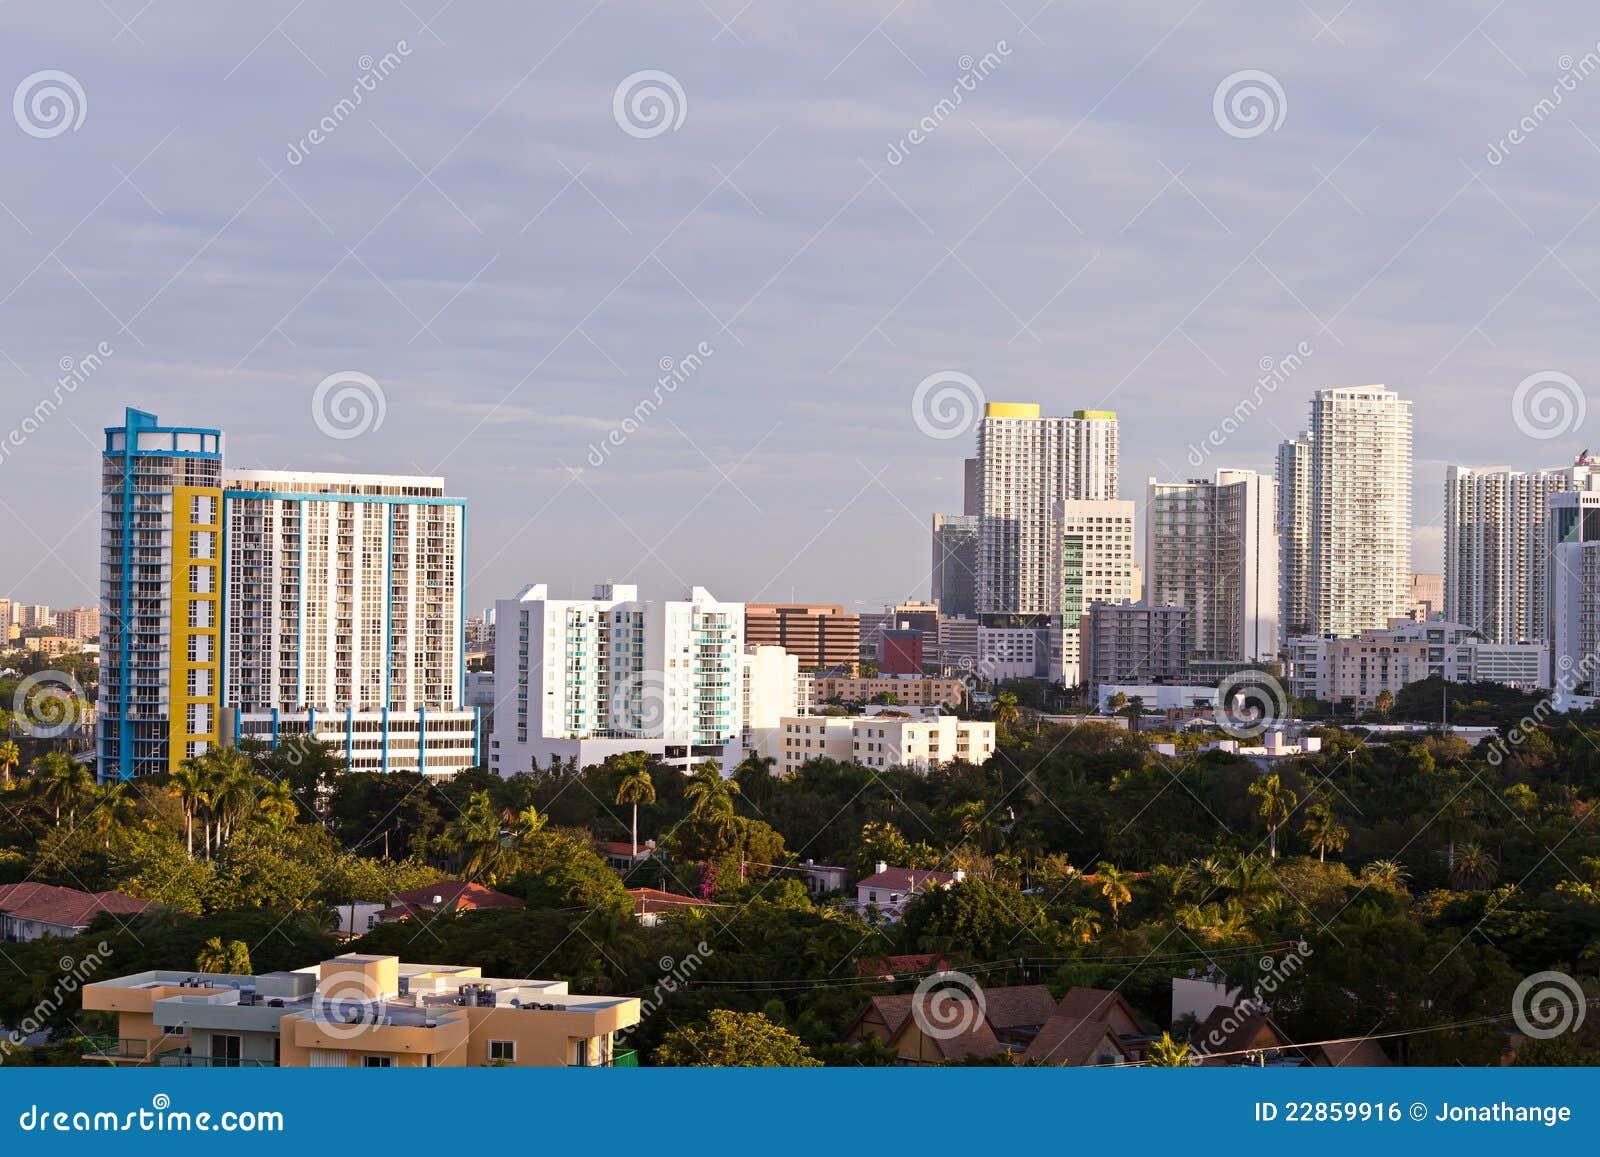 Miami Condos And Apartment Buildings Stock Photo - Image ...